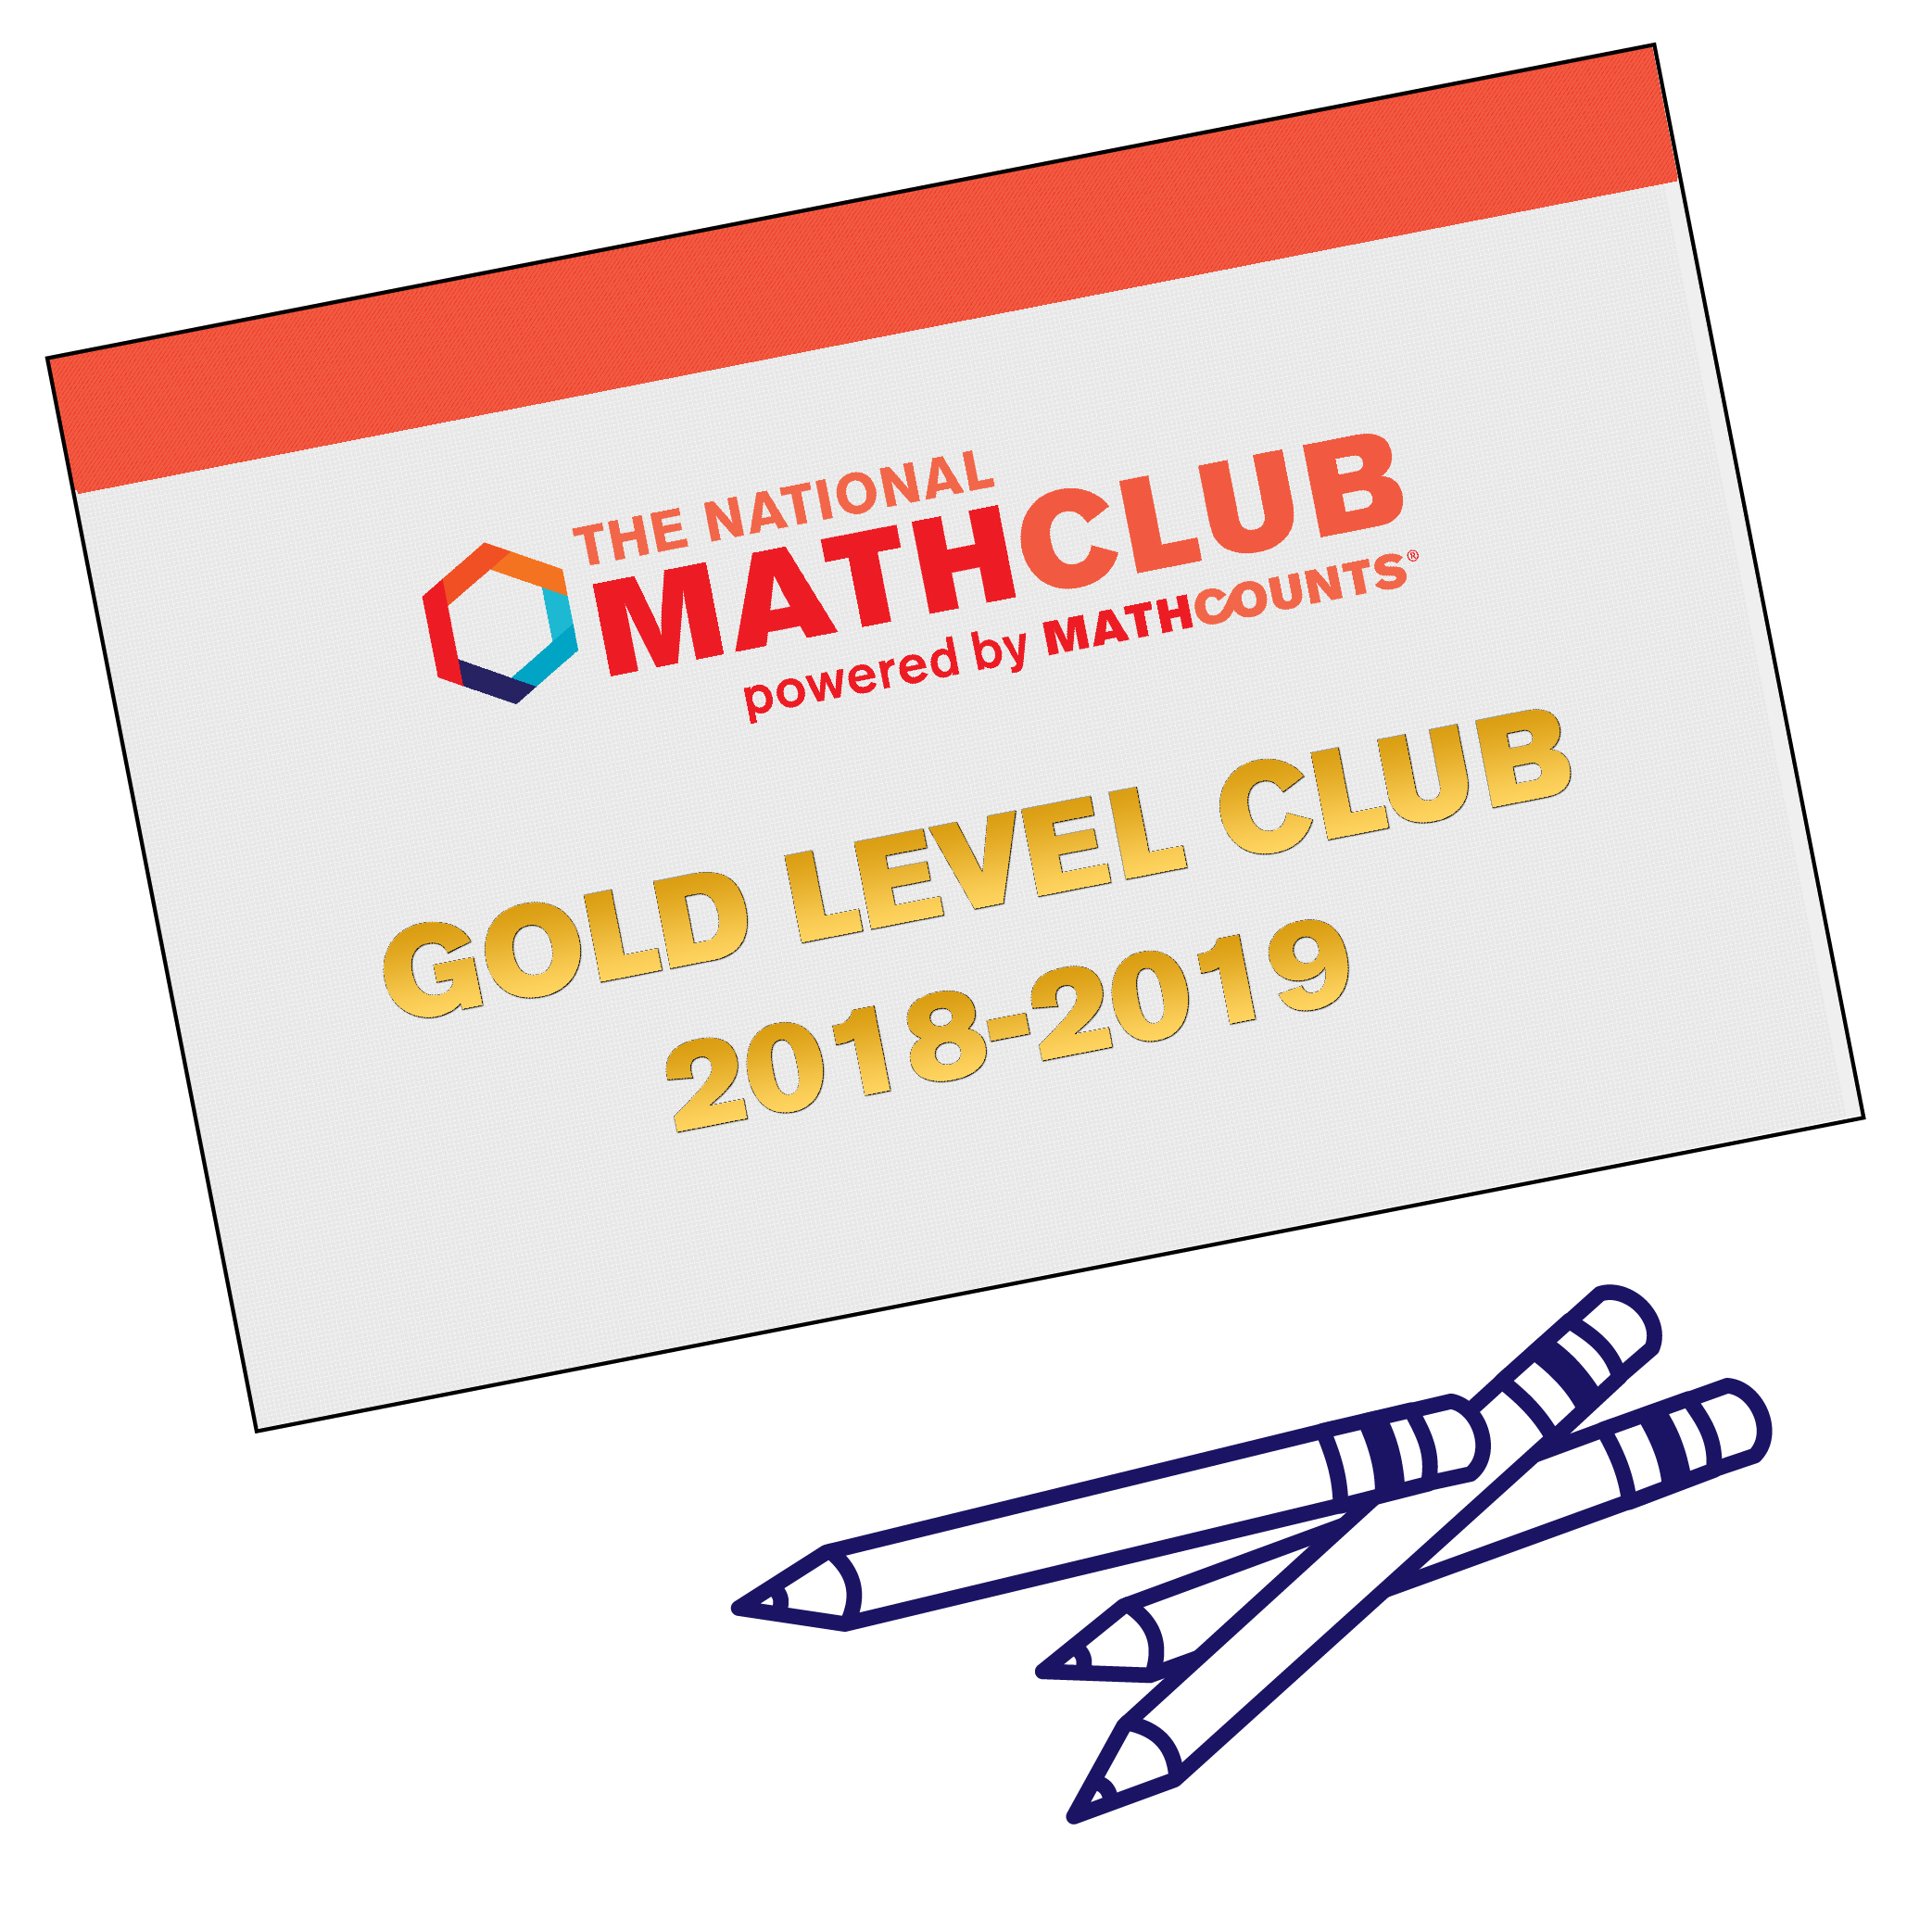 The National Math Club | MATHCOUNTS